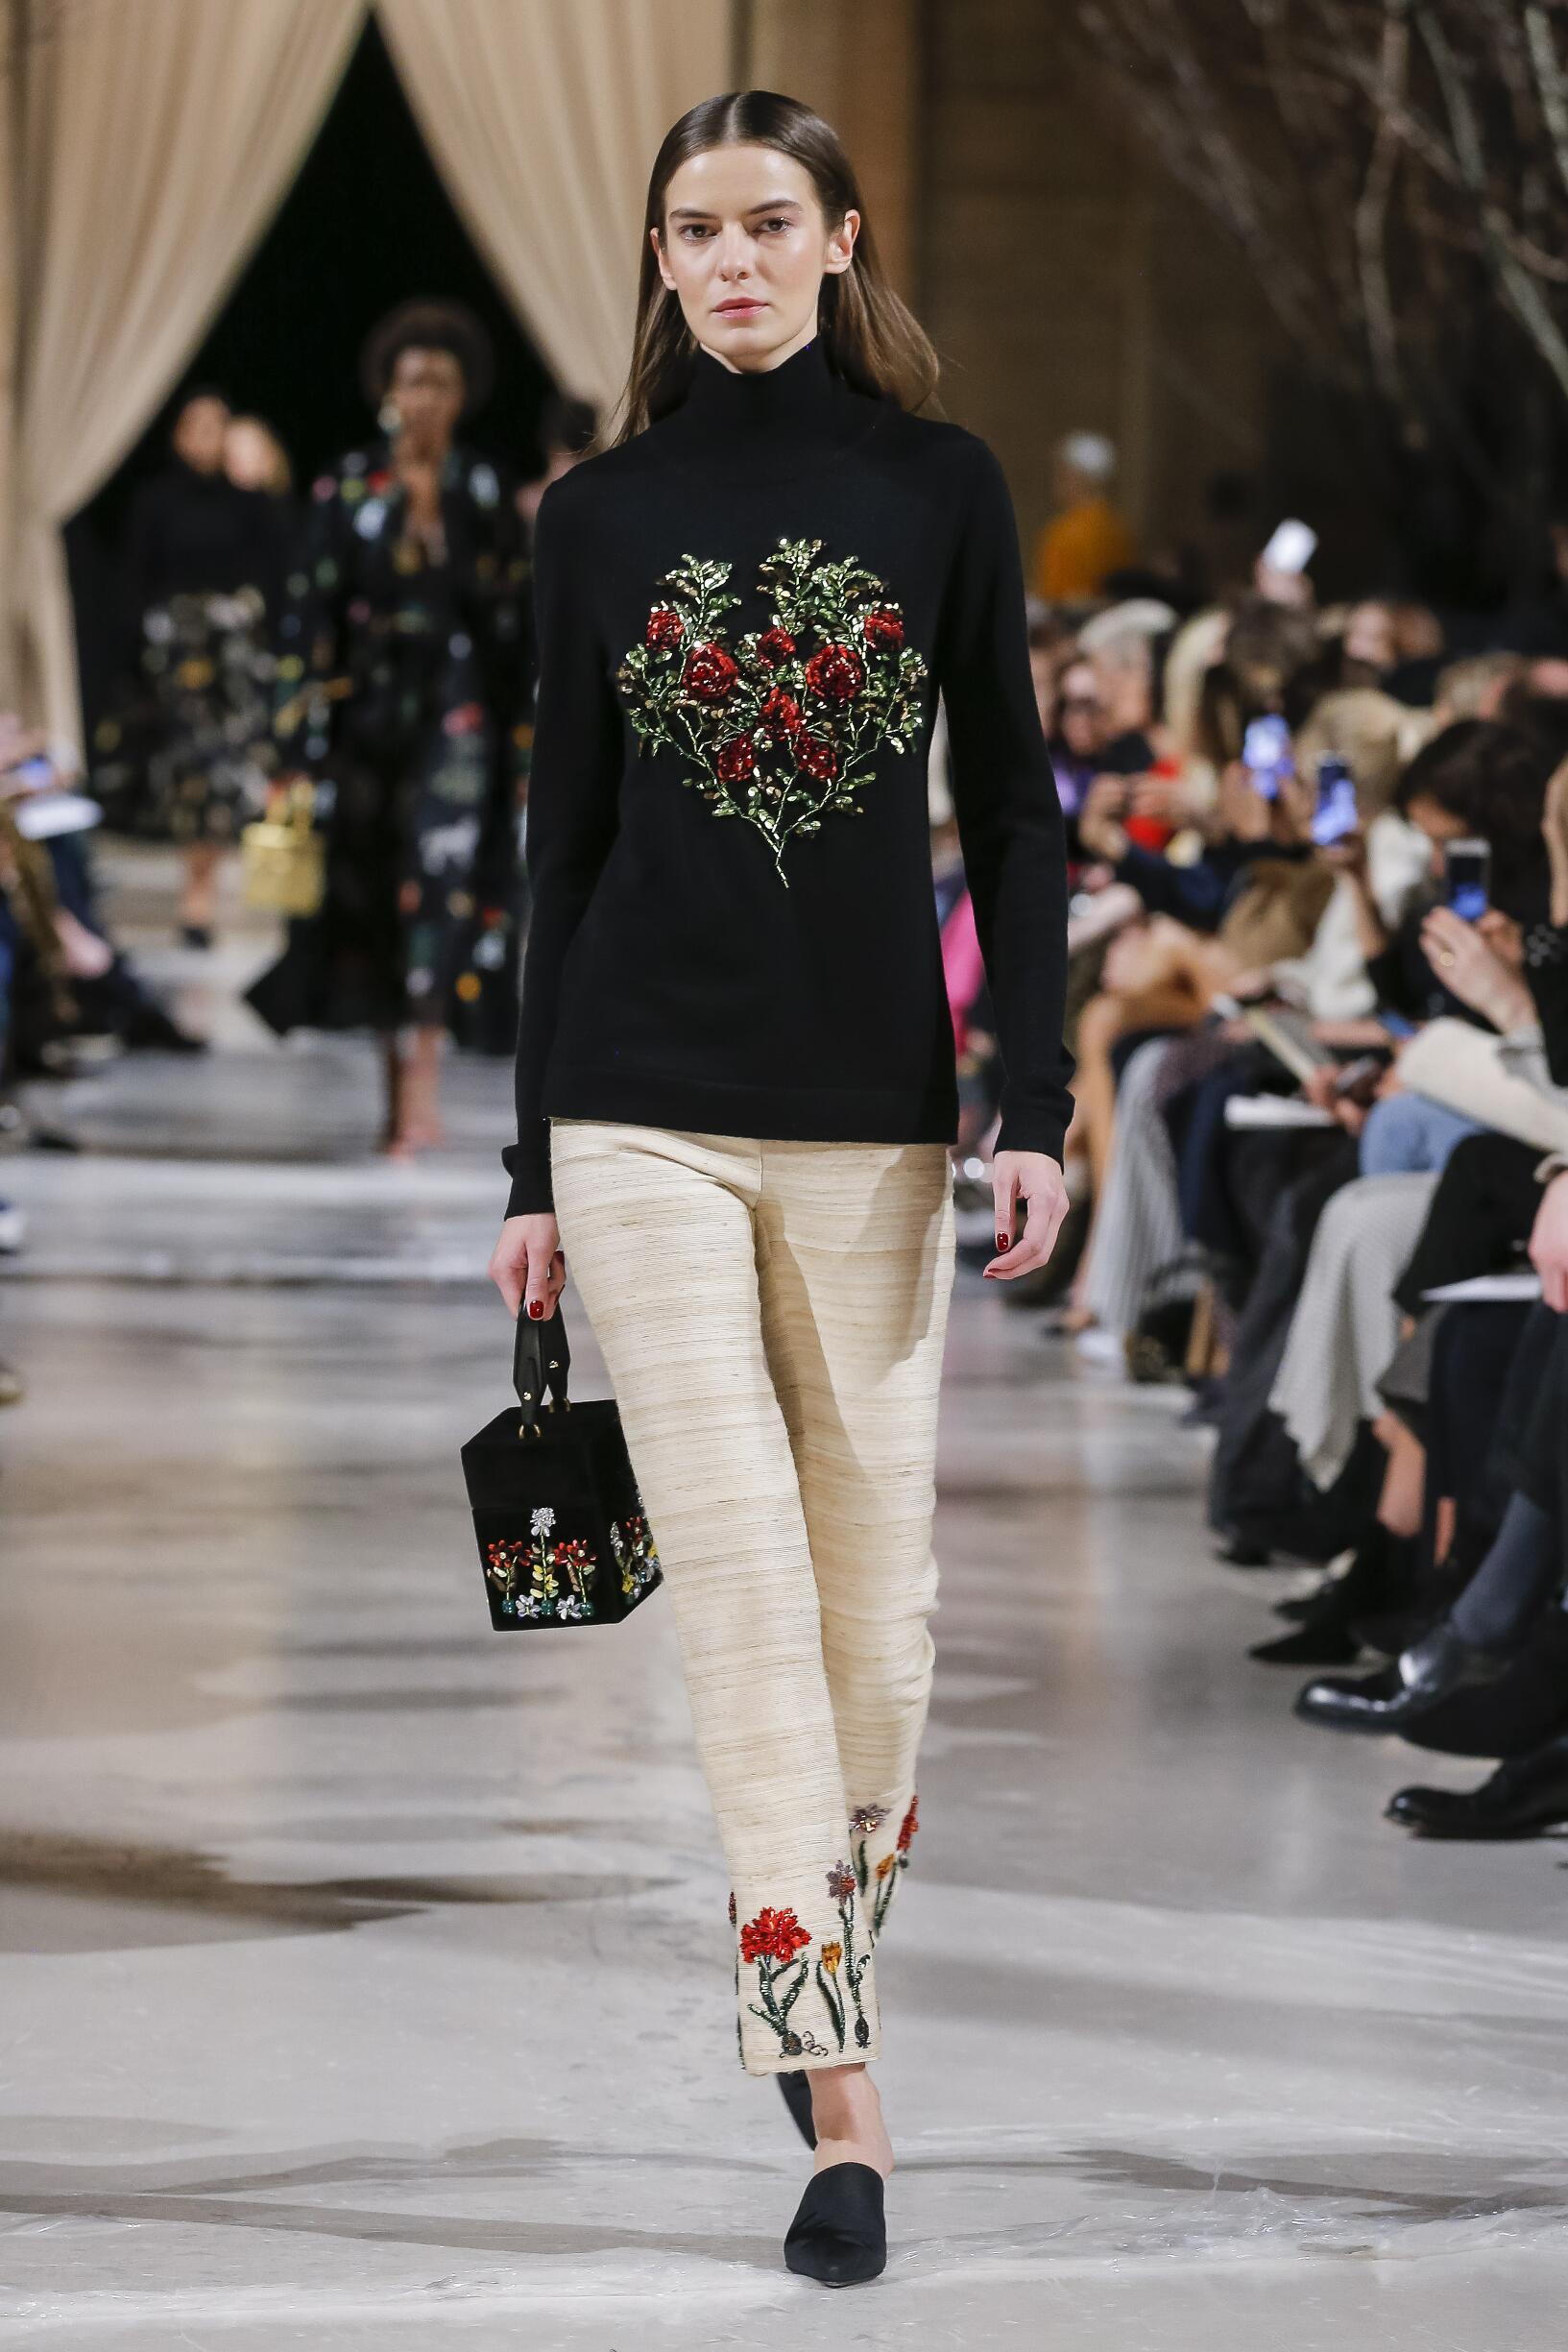 Fall Fashion Woman Trends 2018 Oscar de la Renta